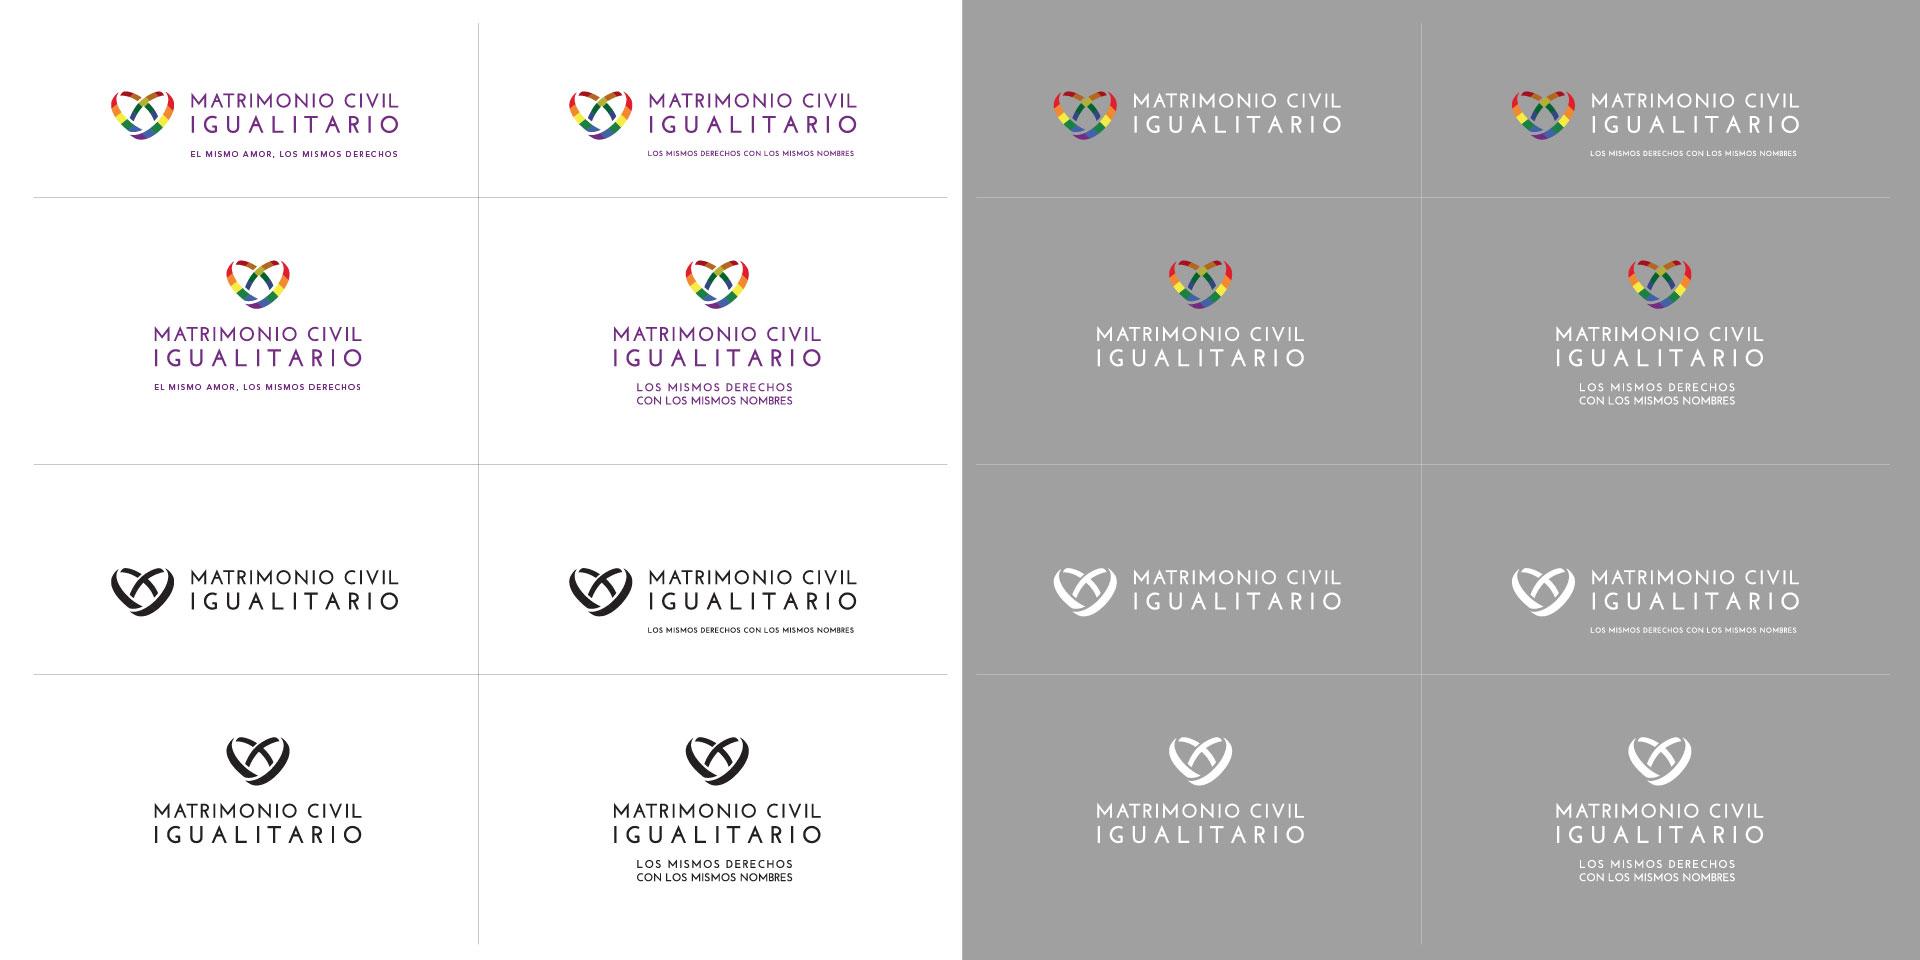 MCI_Branding-Identity03.jpg